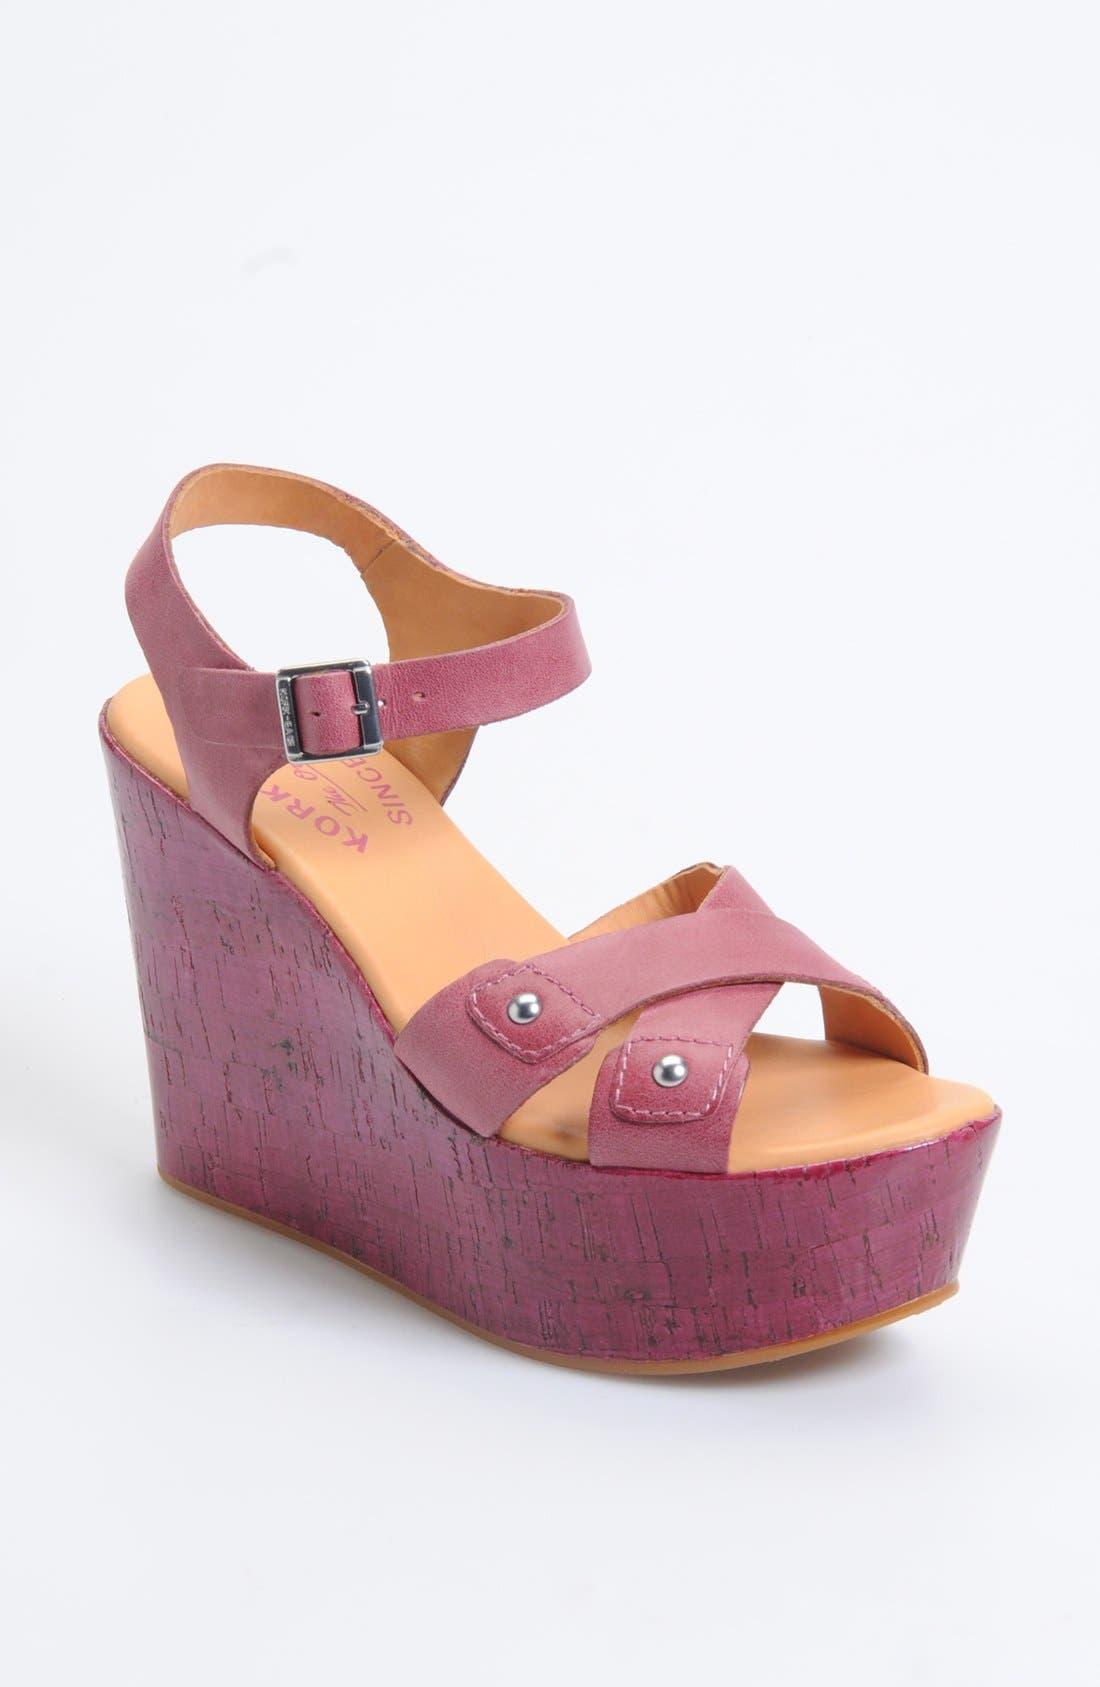 Main Image - Kork-Ease 'Jaclyn' Sandal